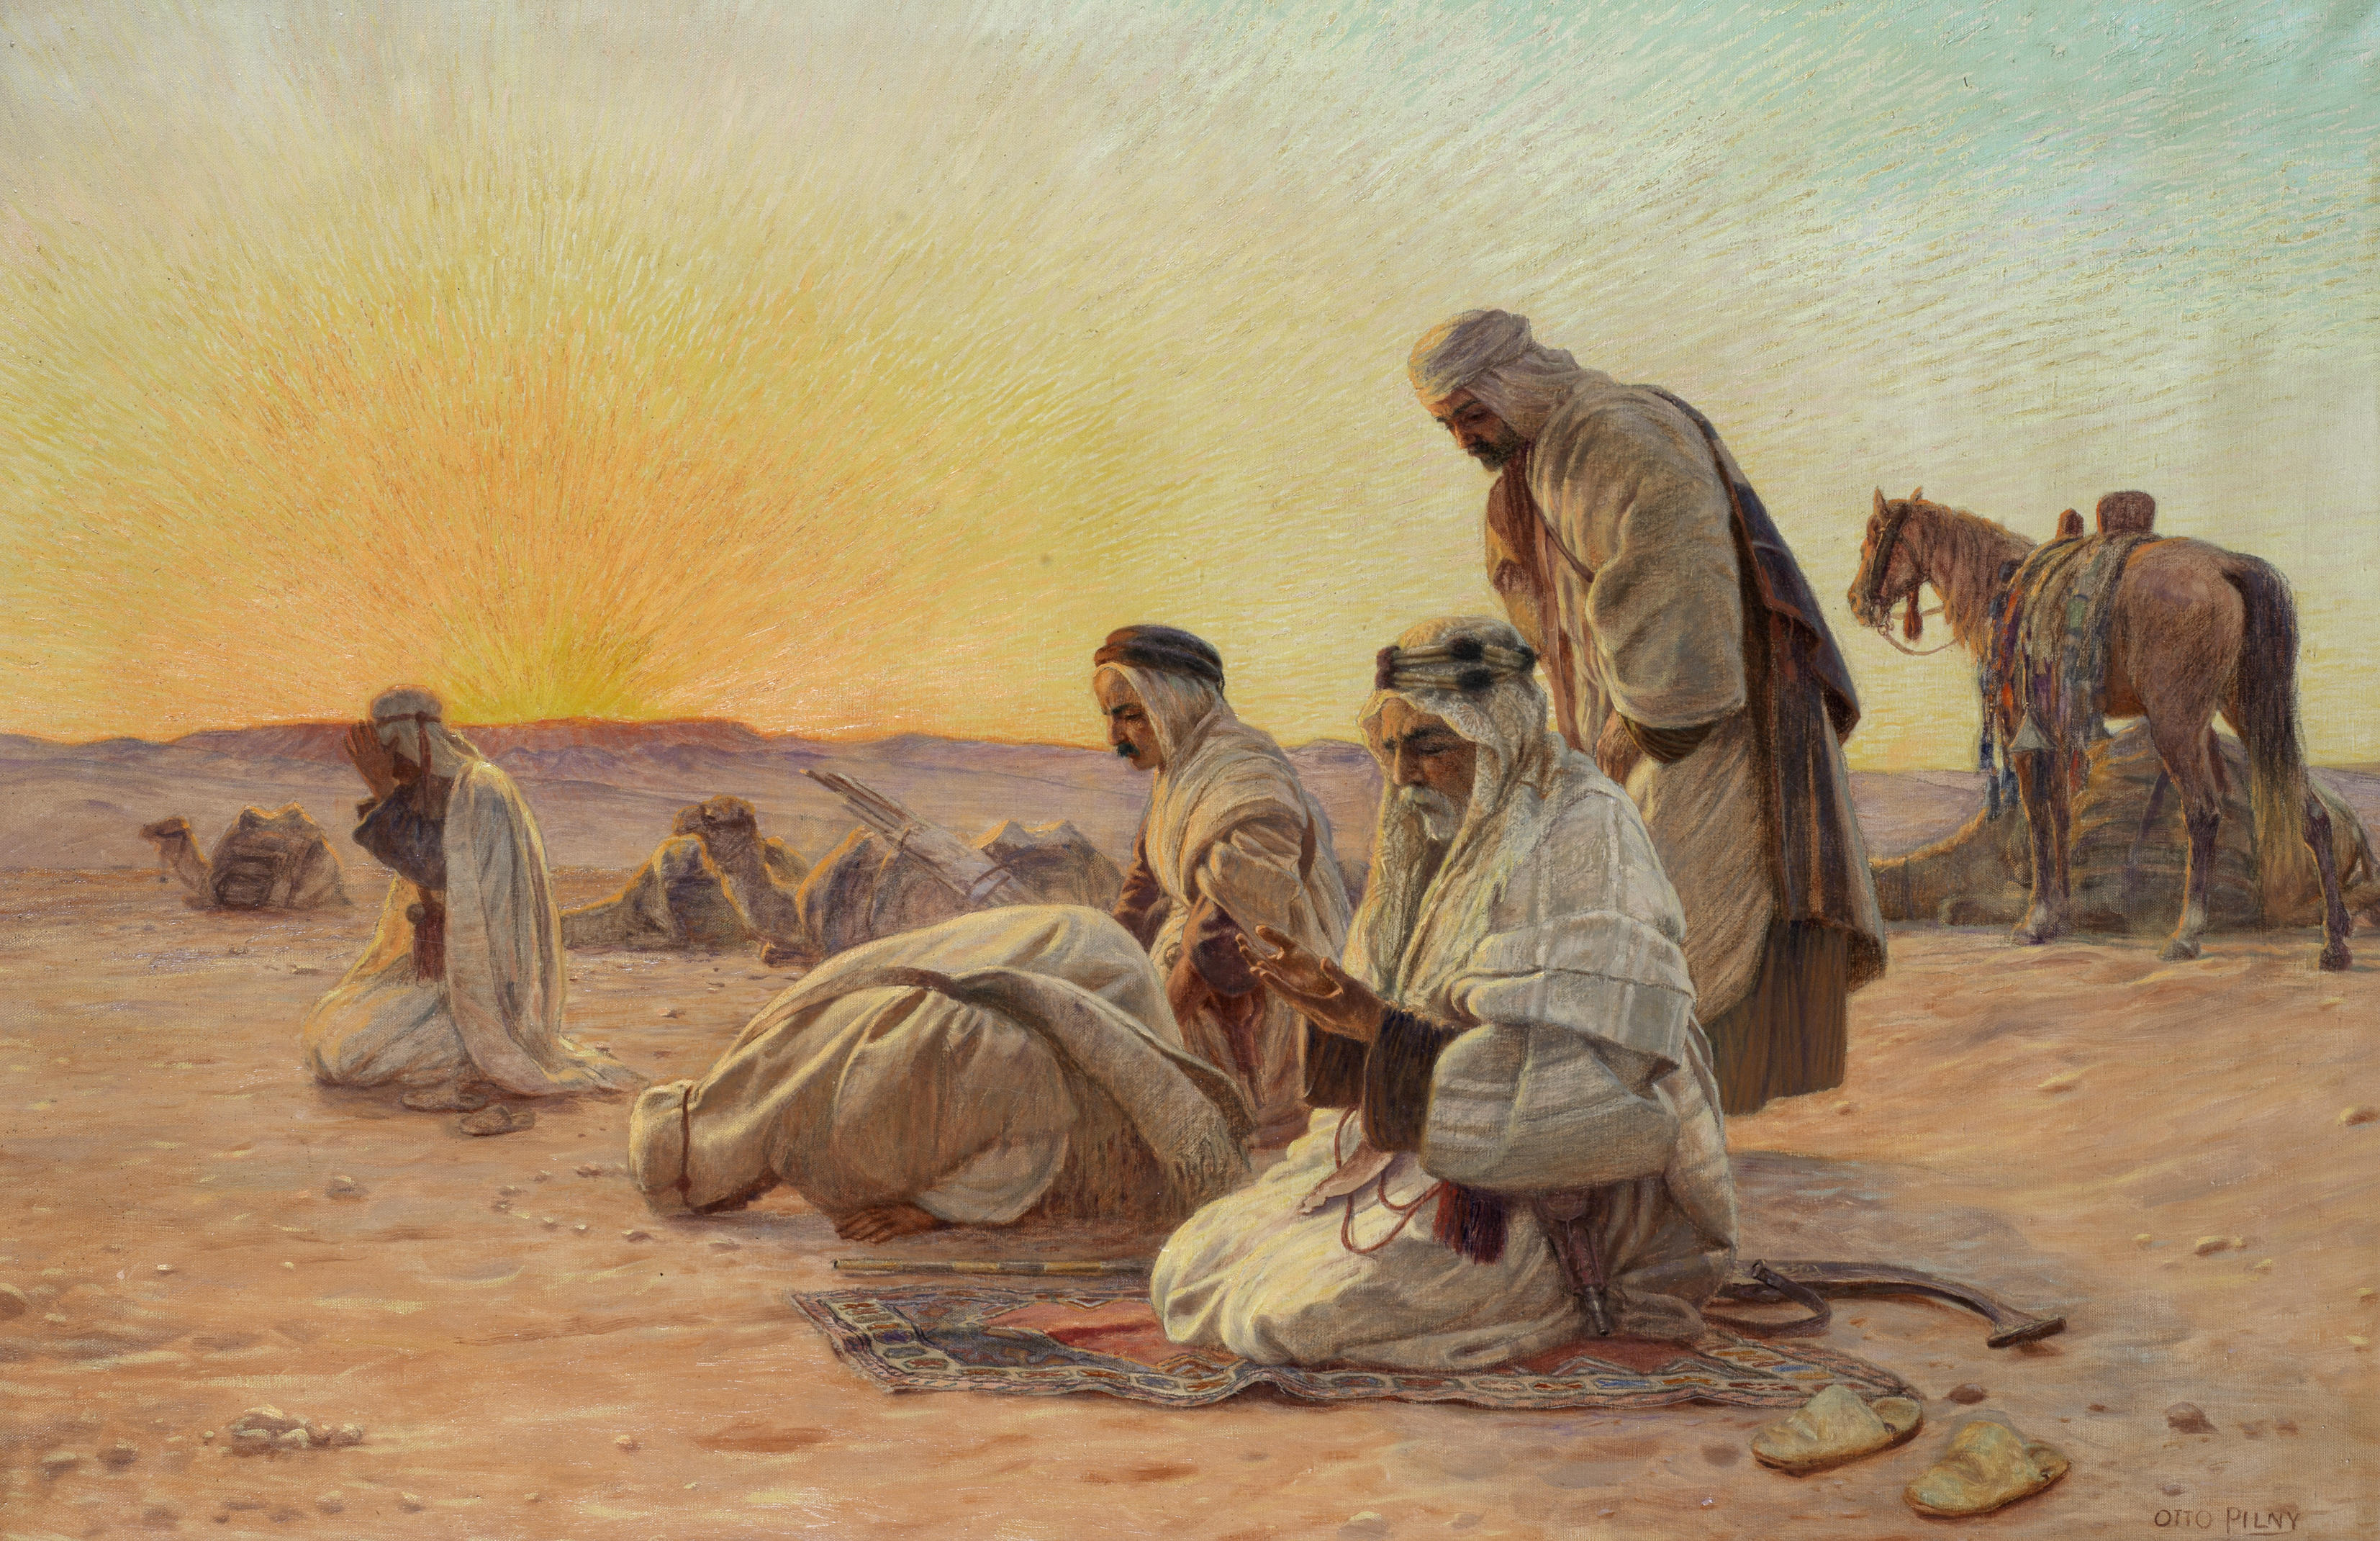 File:Otto Pilny Morning Prayers.jpg - Wikimedia Commons